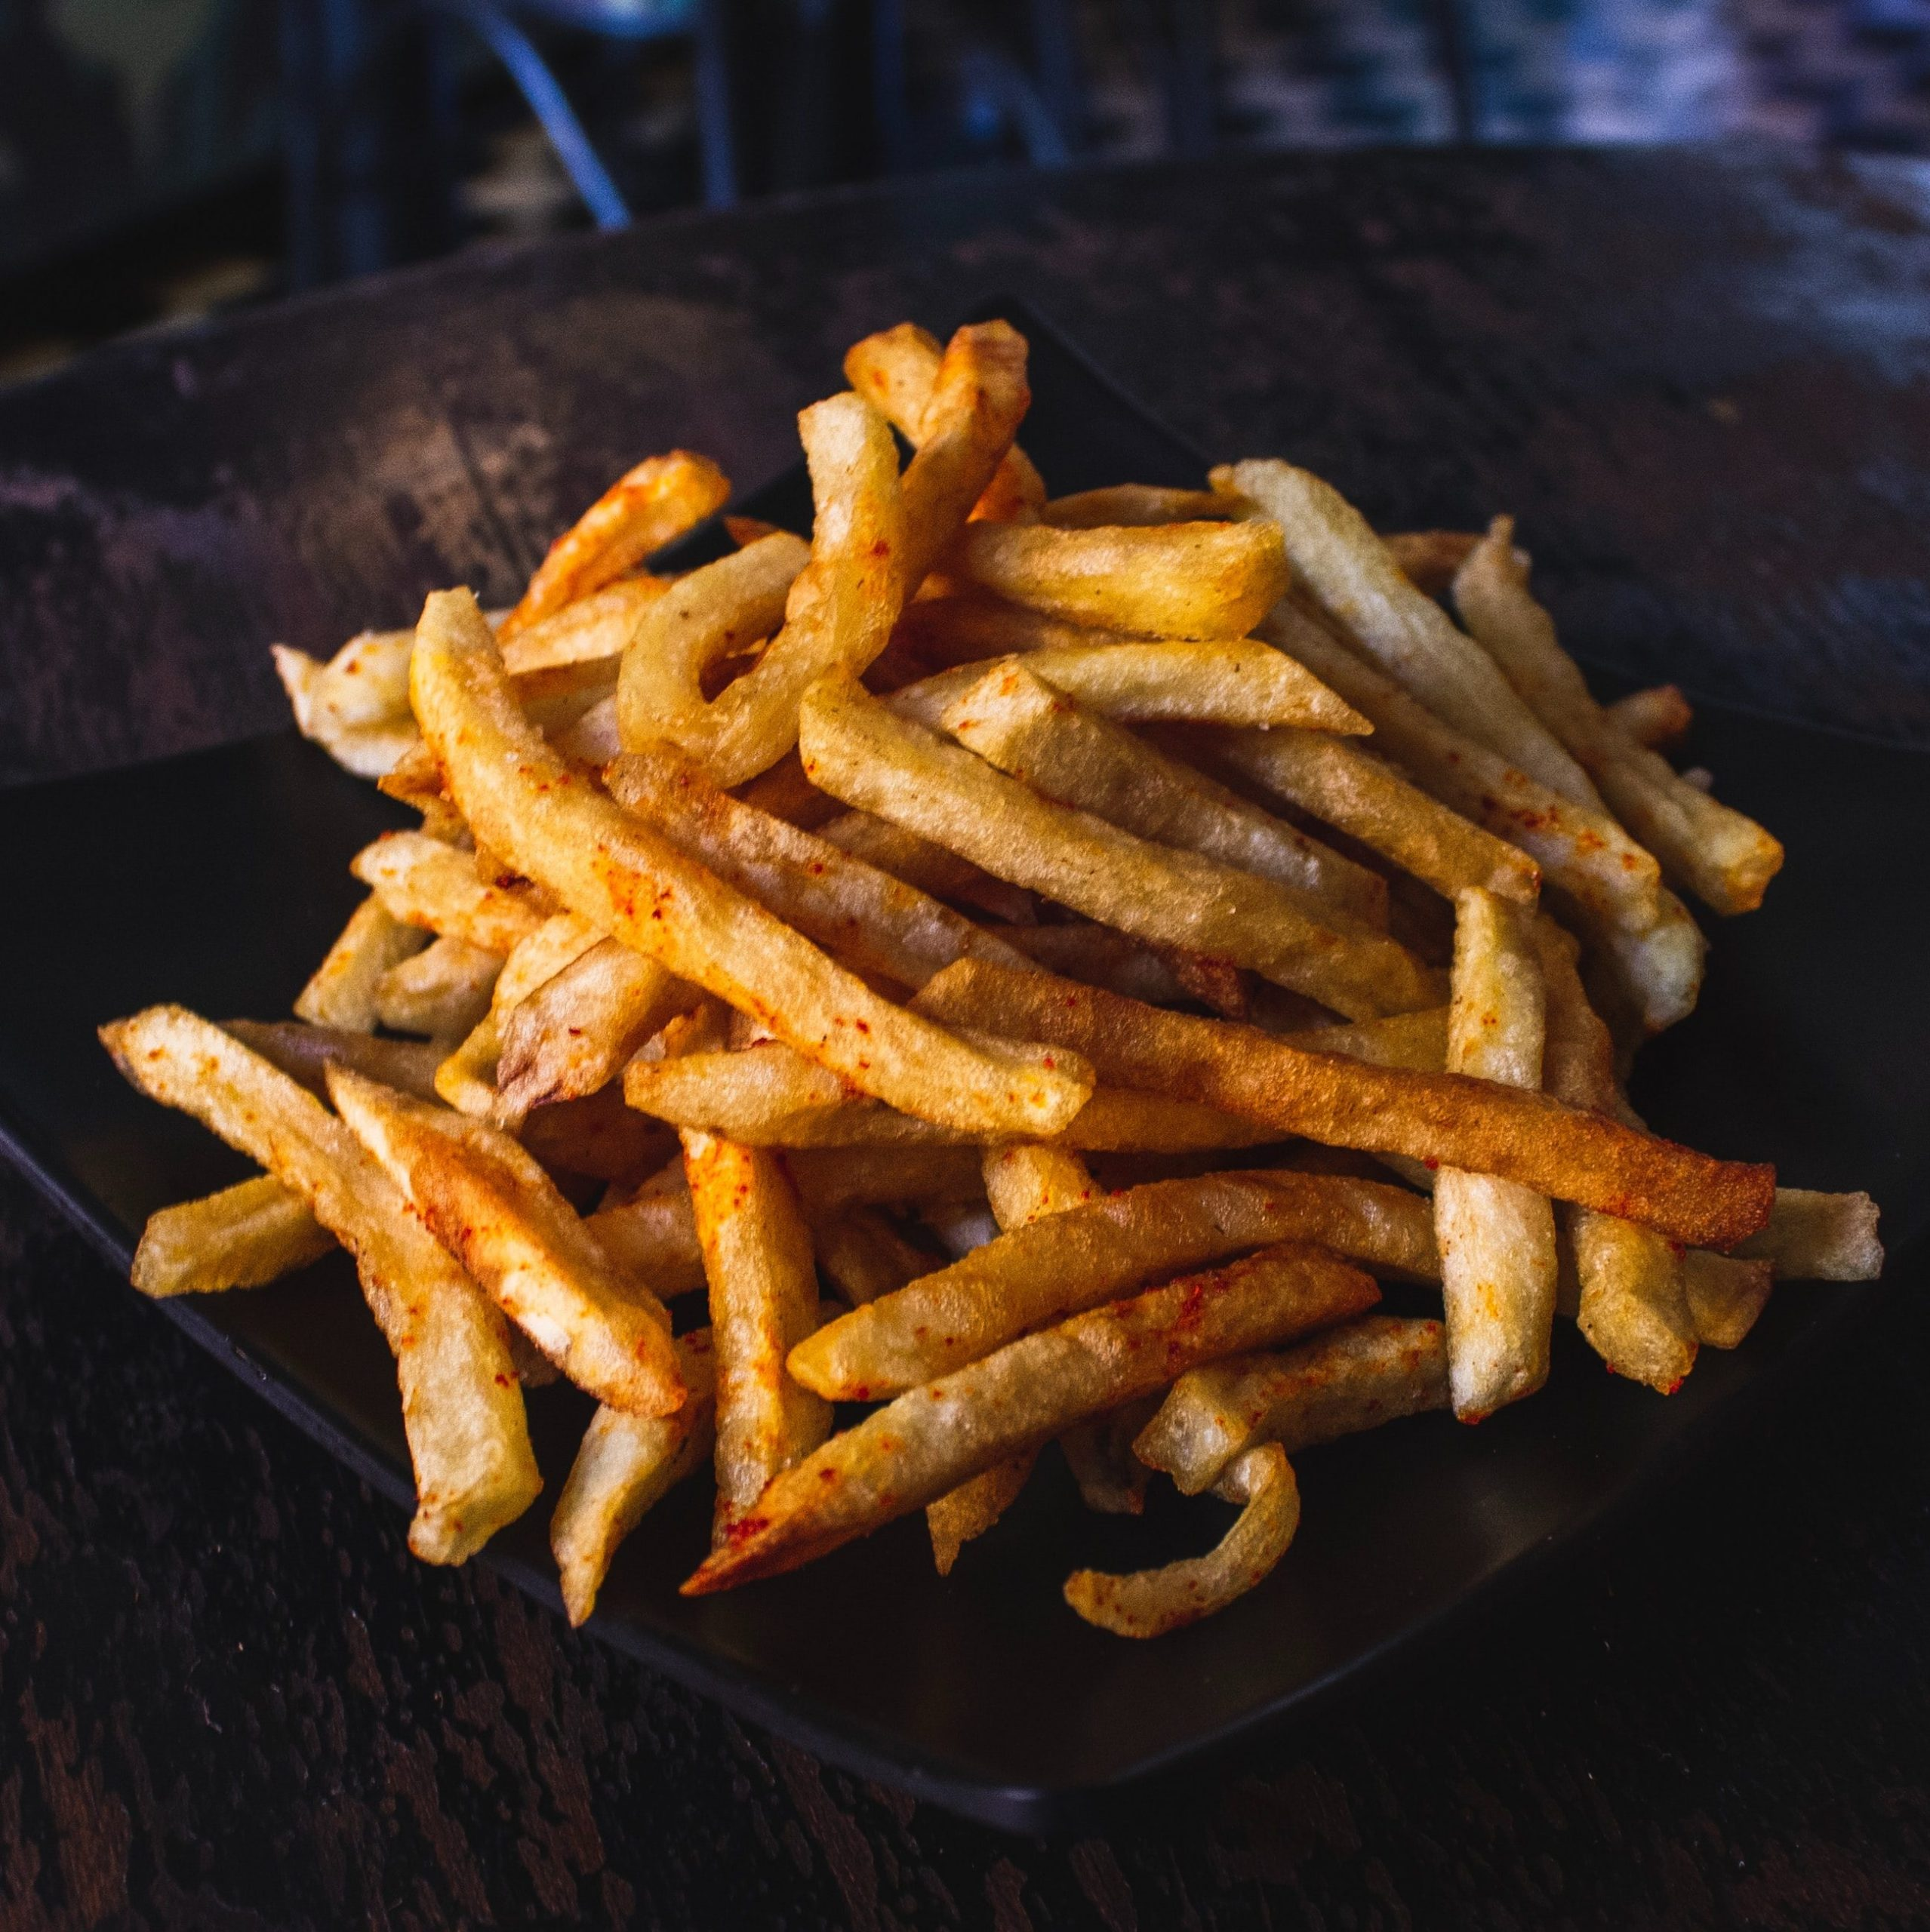 air fryer fries recipe healthy fries no oil oil-less receta de papas fritas para freidora de aire sin aceite papitas sin freir